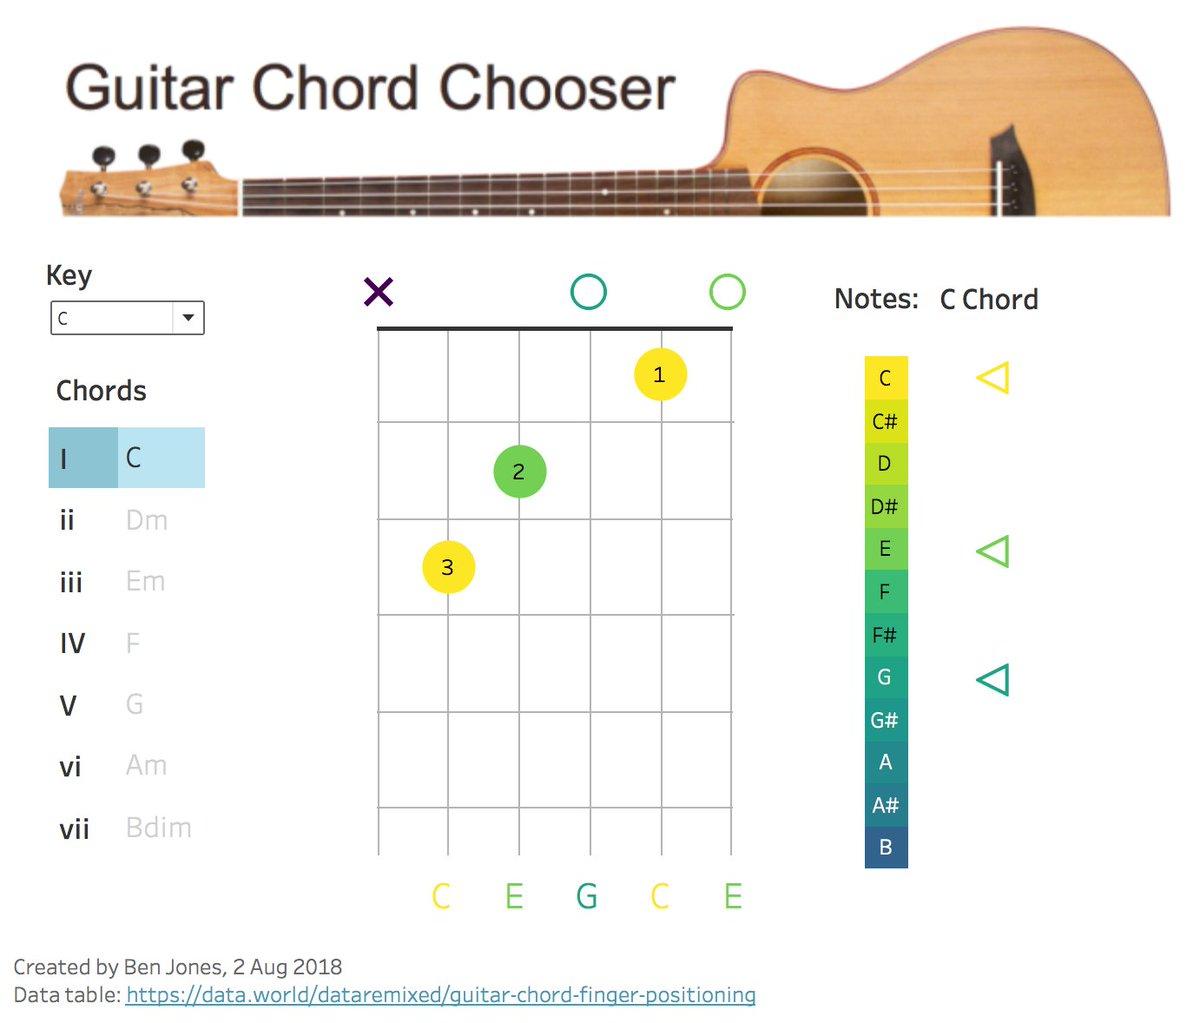 Ben Jones On Twitter I Made A Guitar Chord Chooser For The August